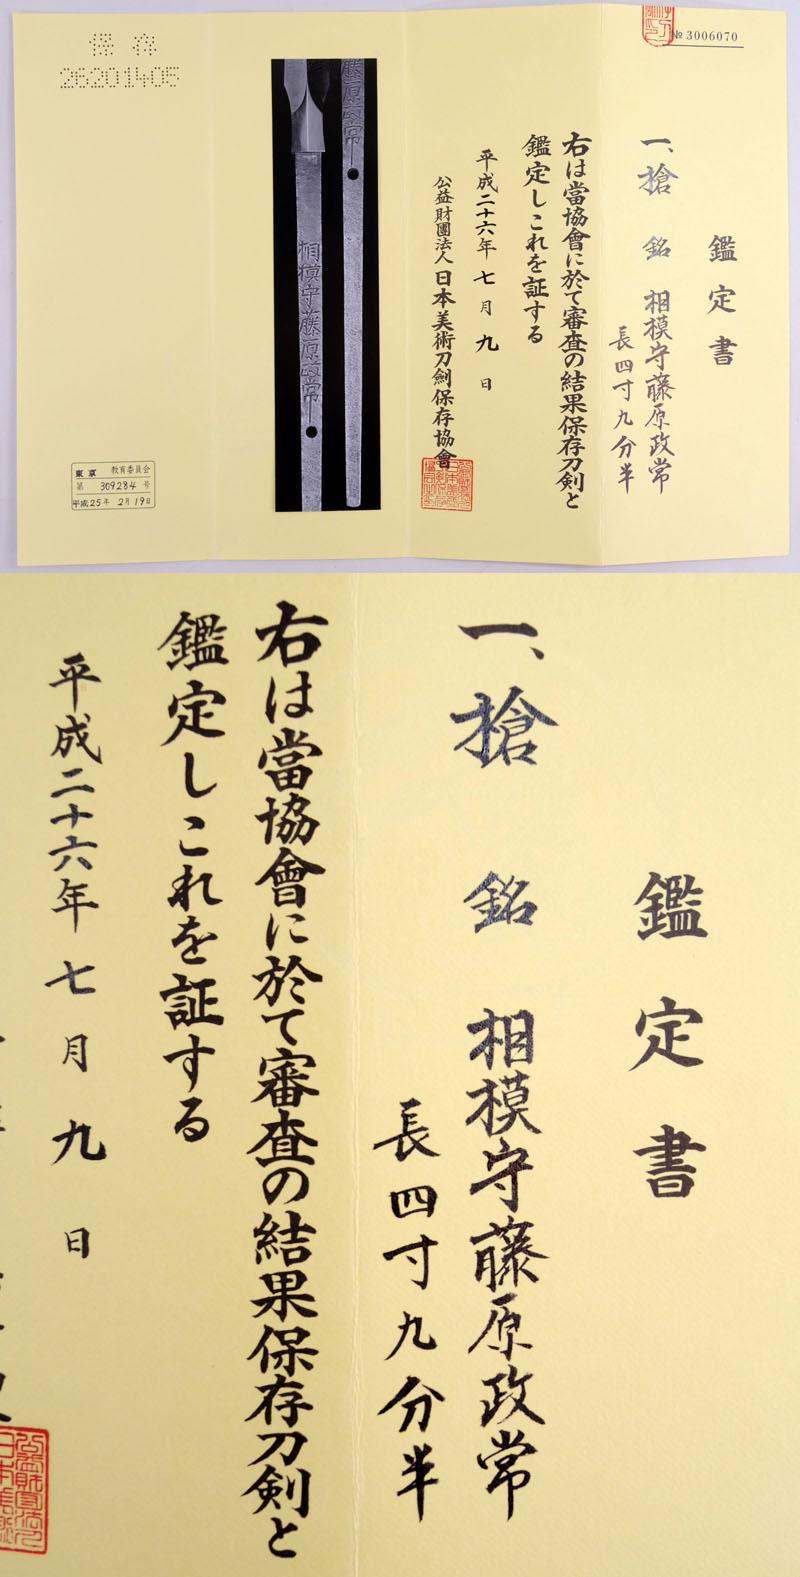 相模守藤原政常 Picture of Certificate